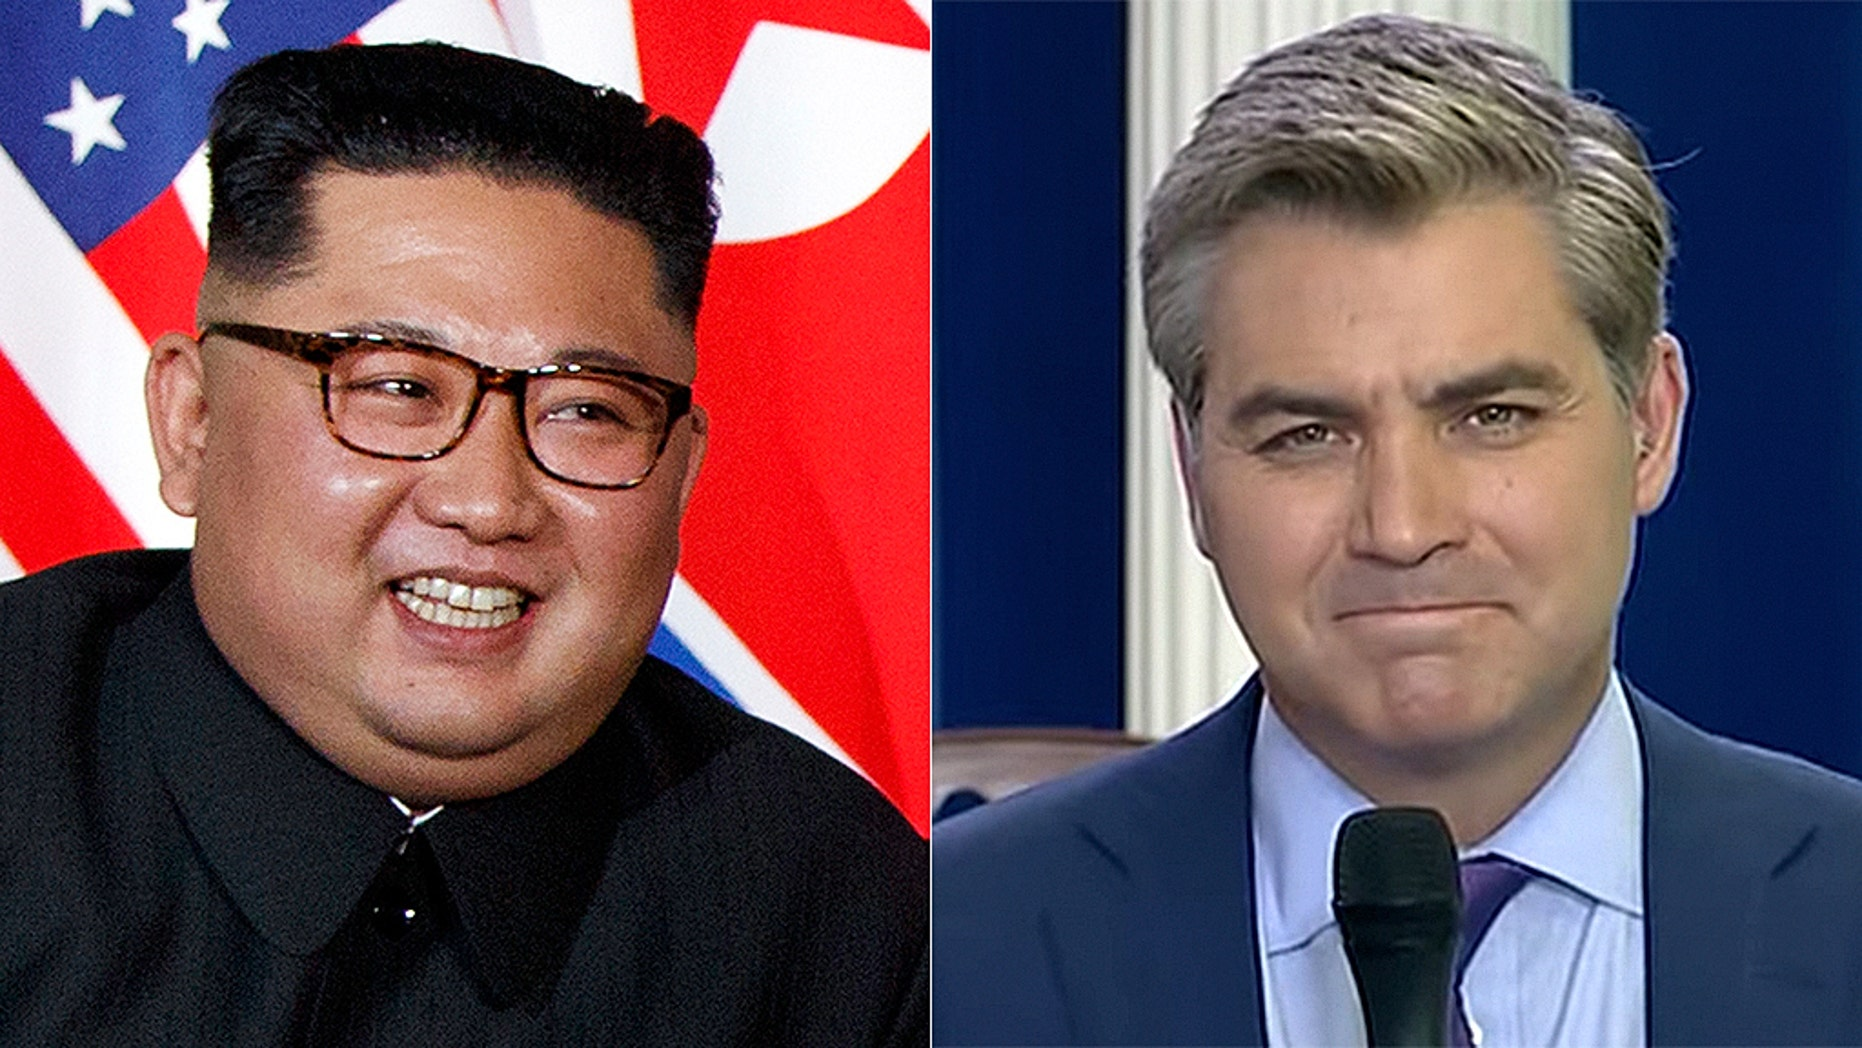 North Korean leader Kim Jong Un, left, got a taste of CNN star Jim Acosta's grandstanding questions Tuesday.